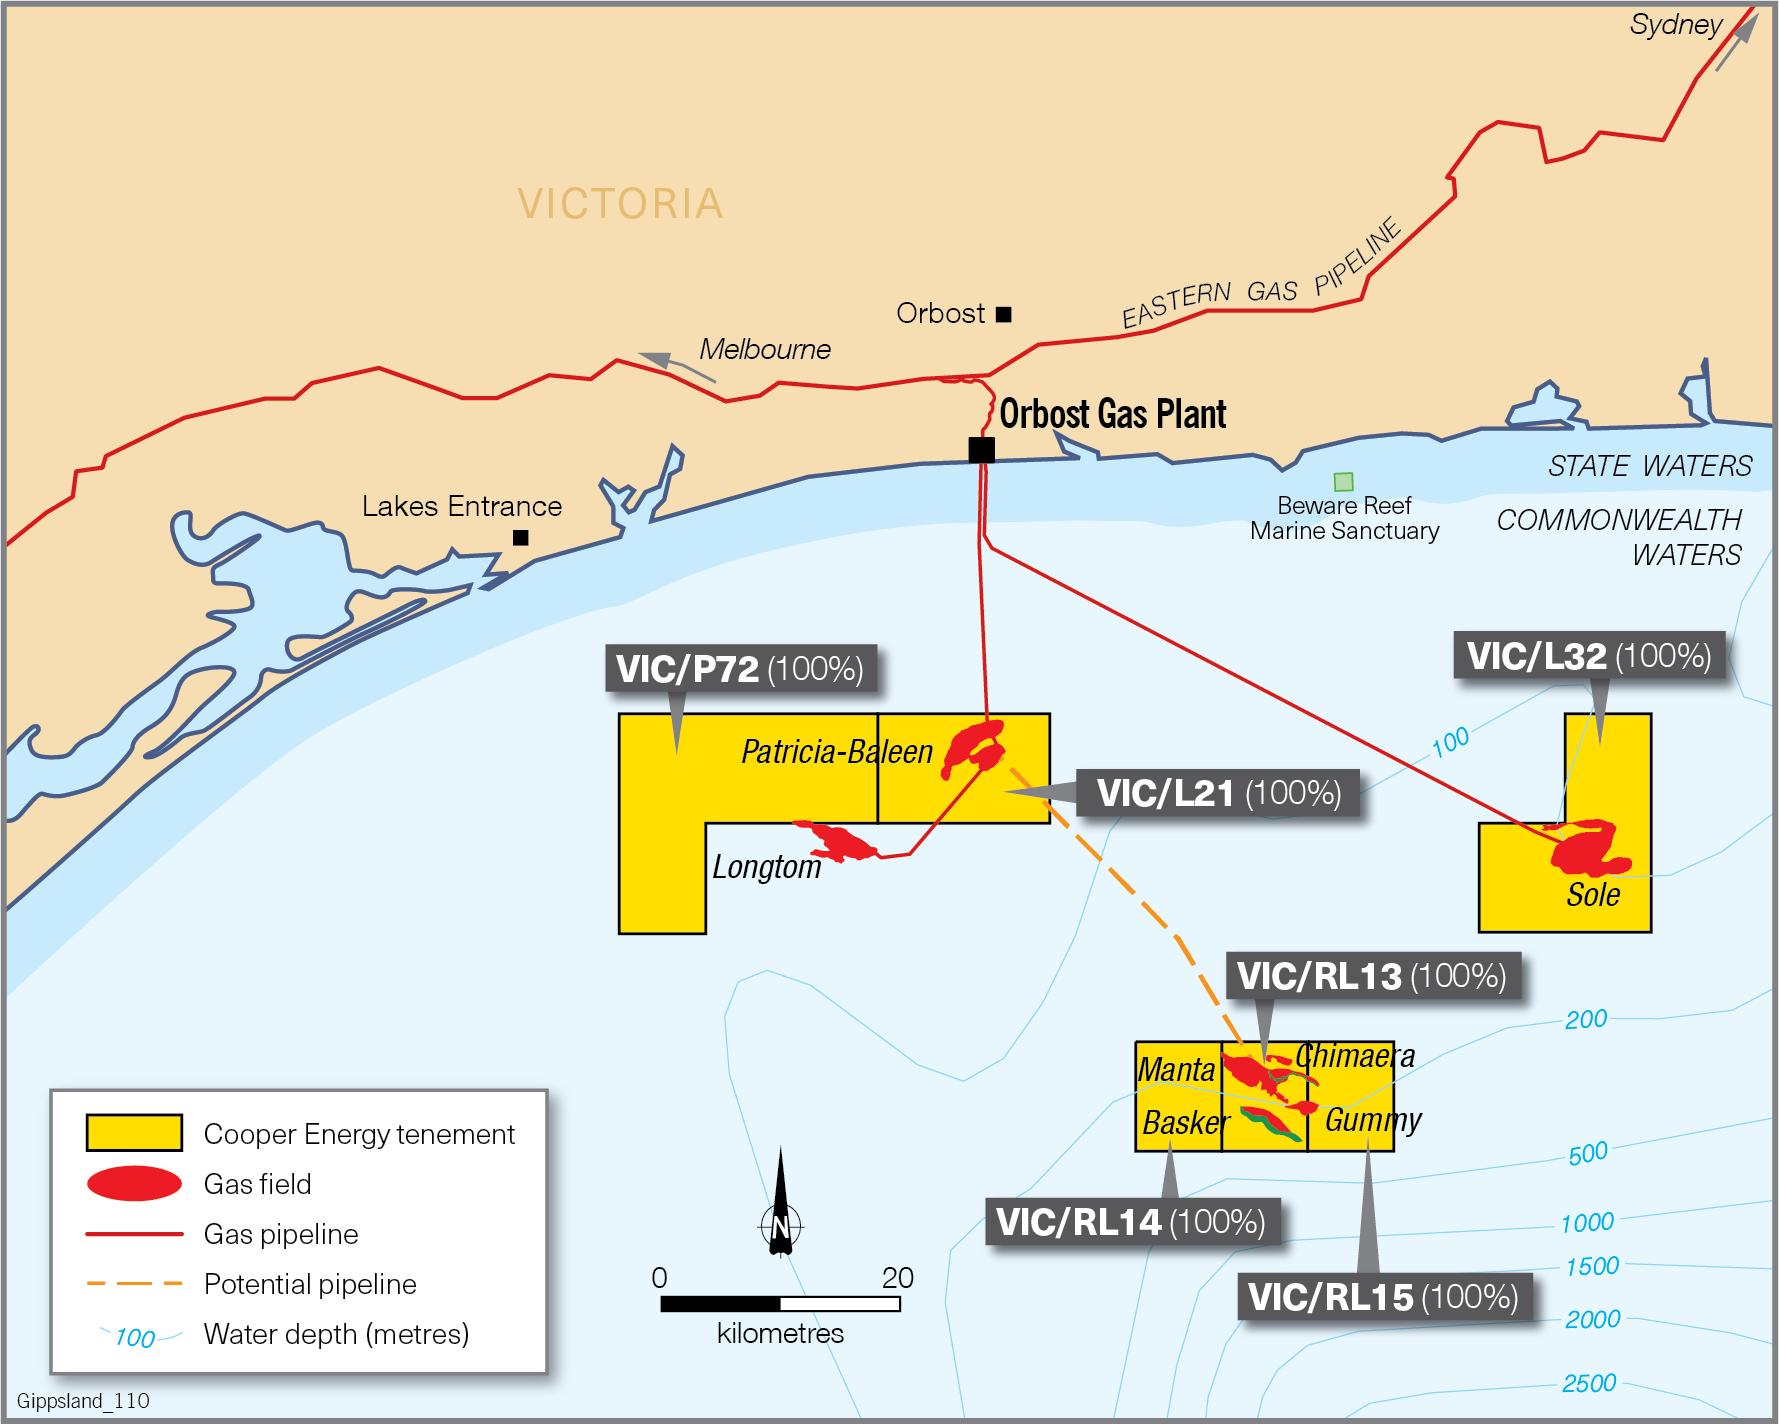 Project map - Gippsland Offshore Development  (refer to Description)